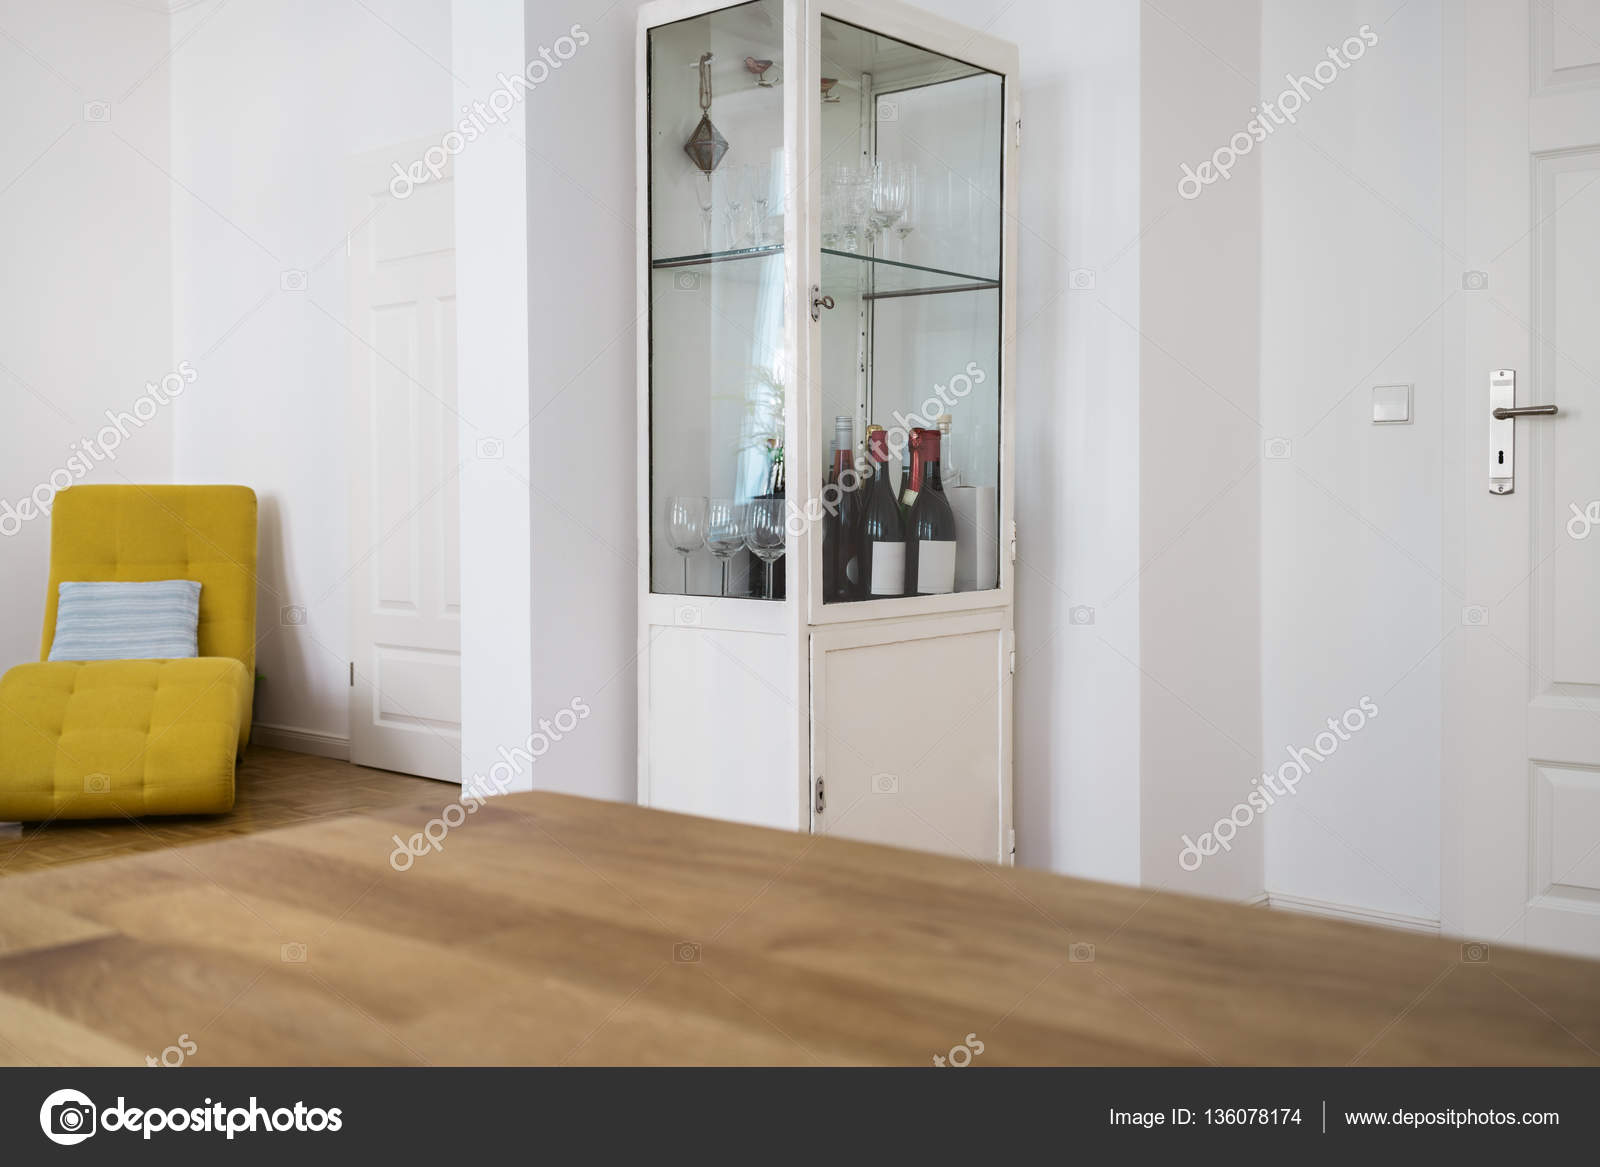 Glas Wein Kabinett U2014 Stockfoto